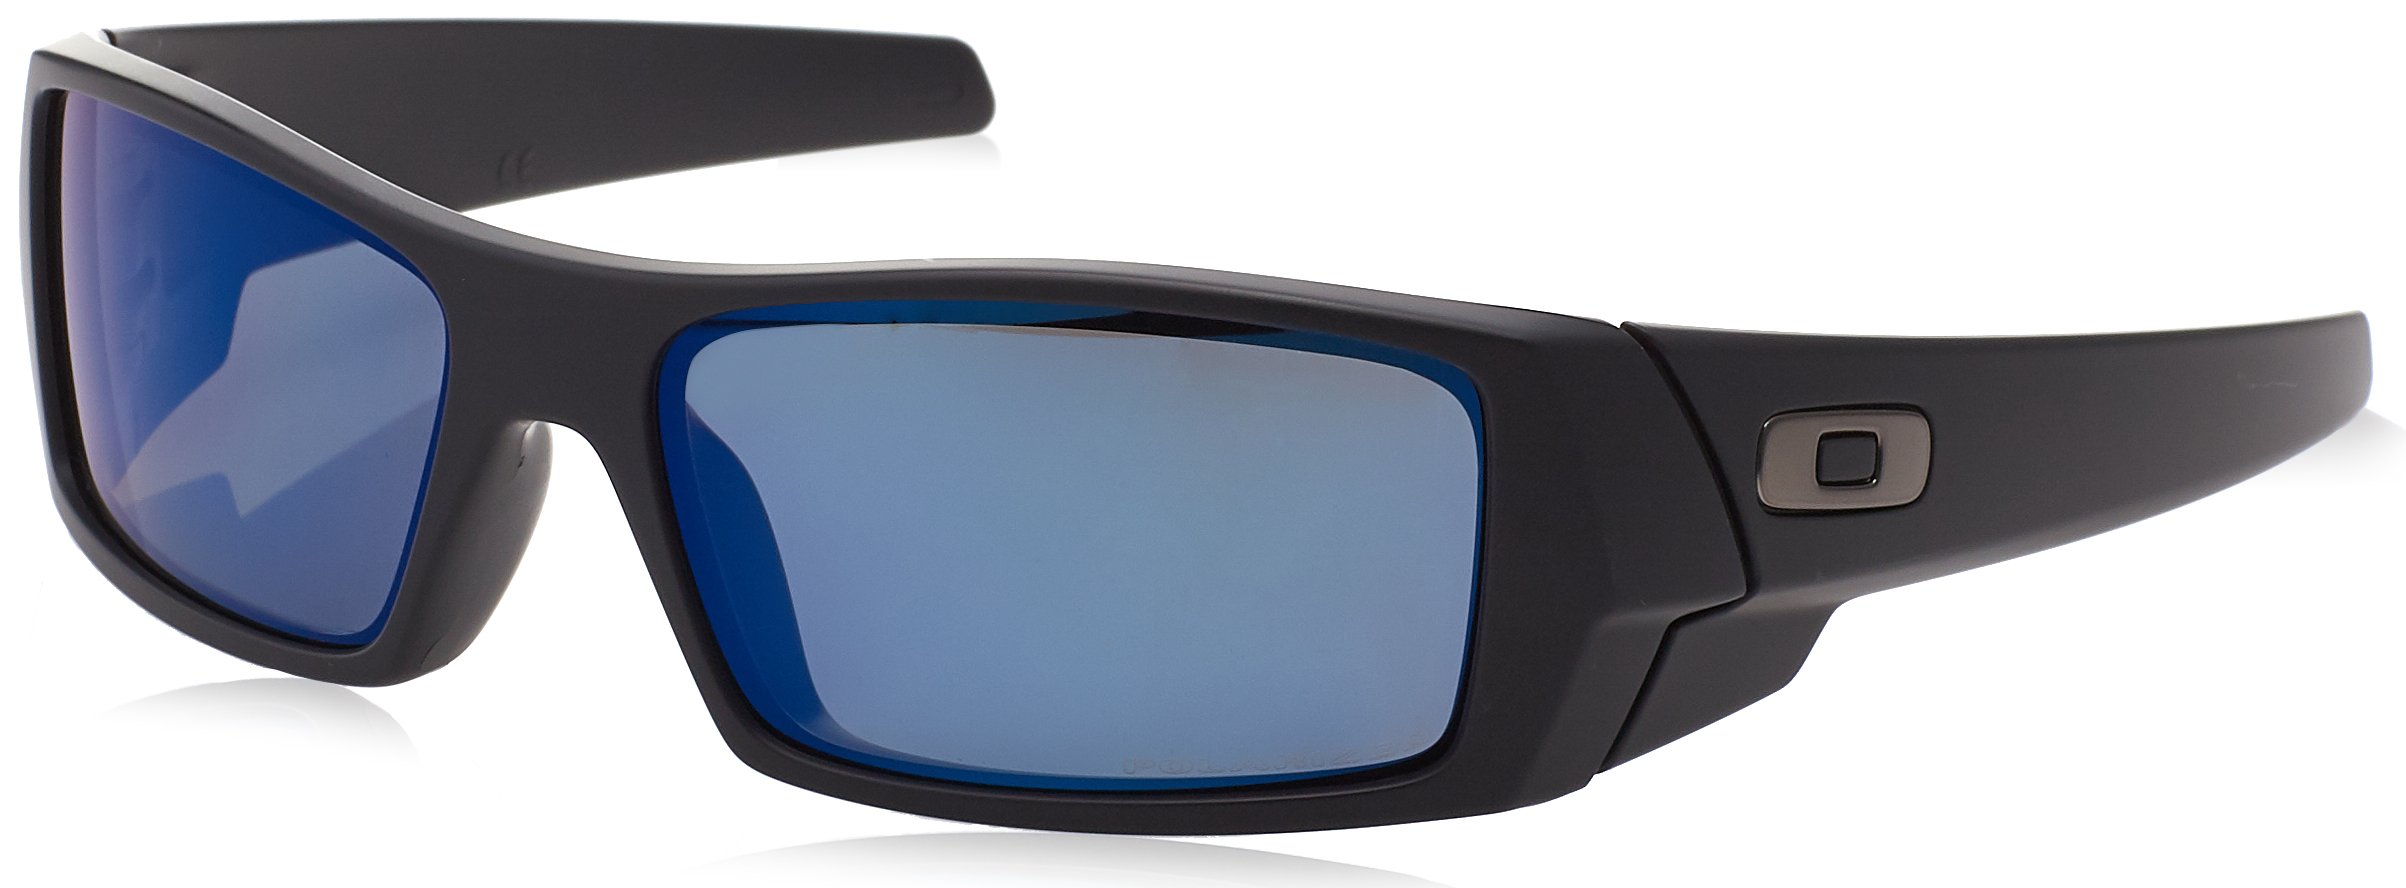 Oakley Men's Gascan Iridium Polarized Rectangular Sunglasses, Matte Black /Ice, 60mm by Oakley